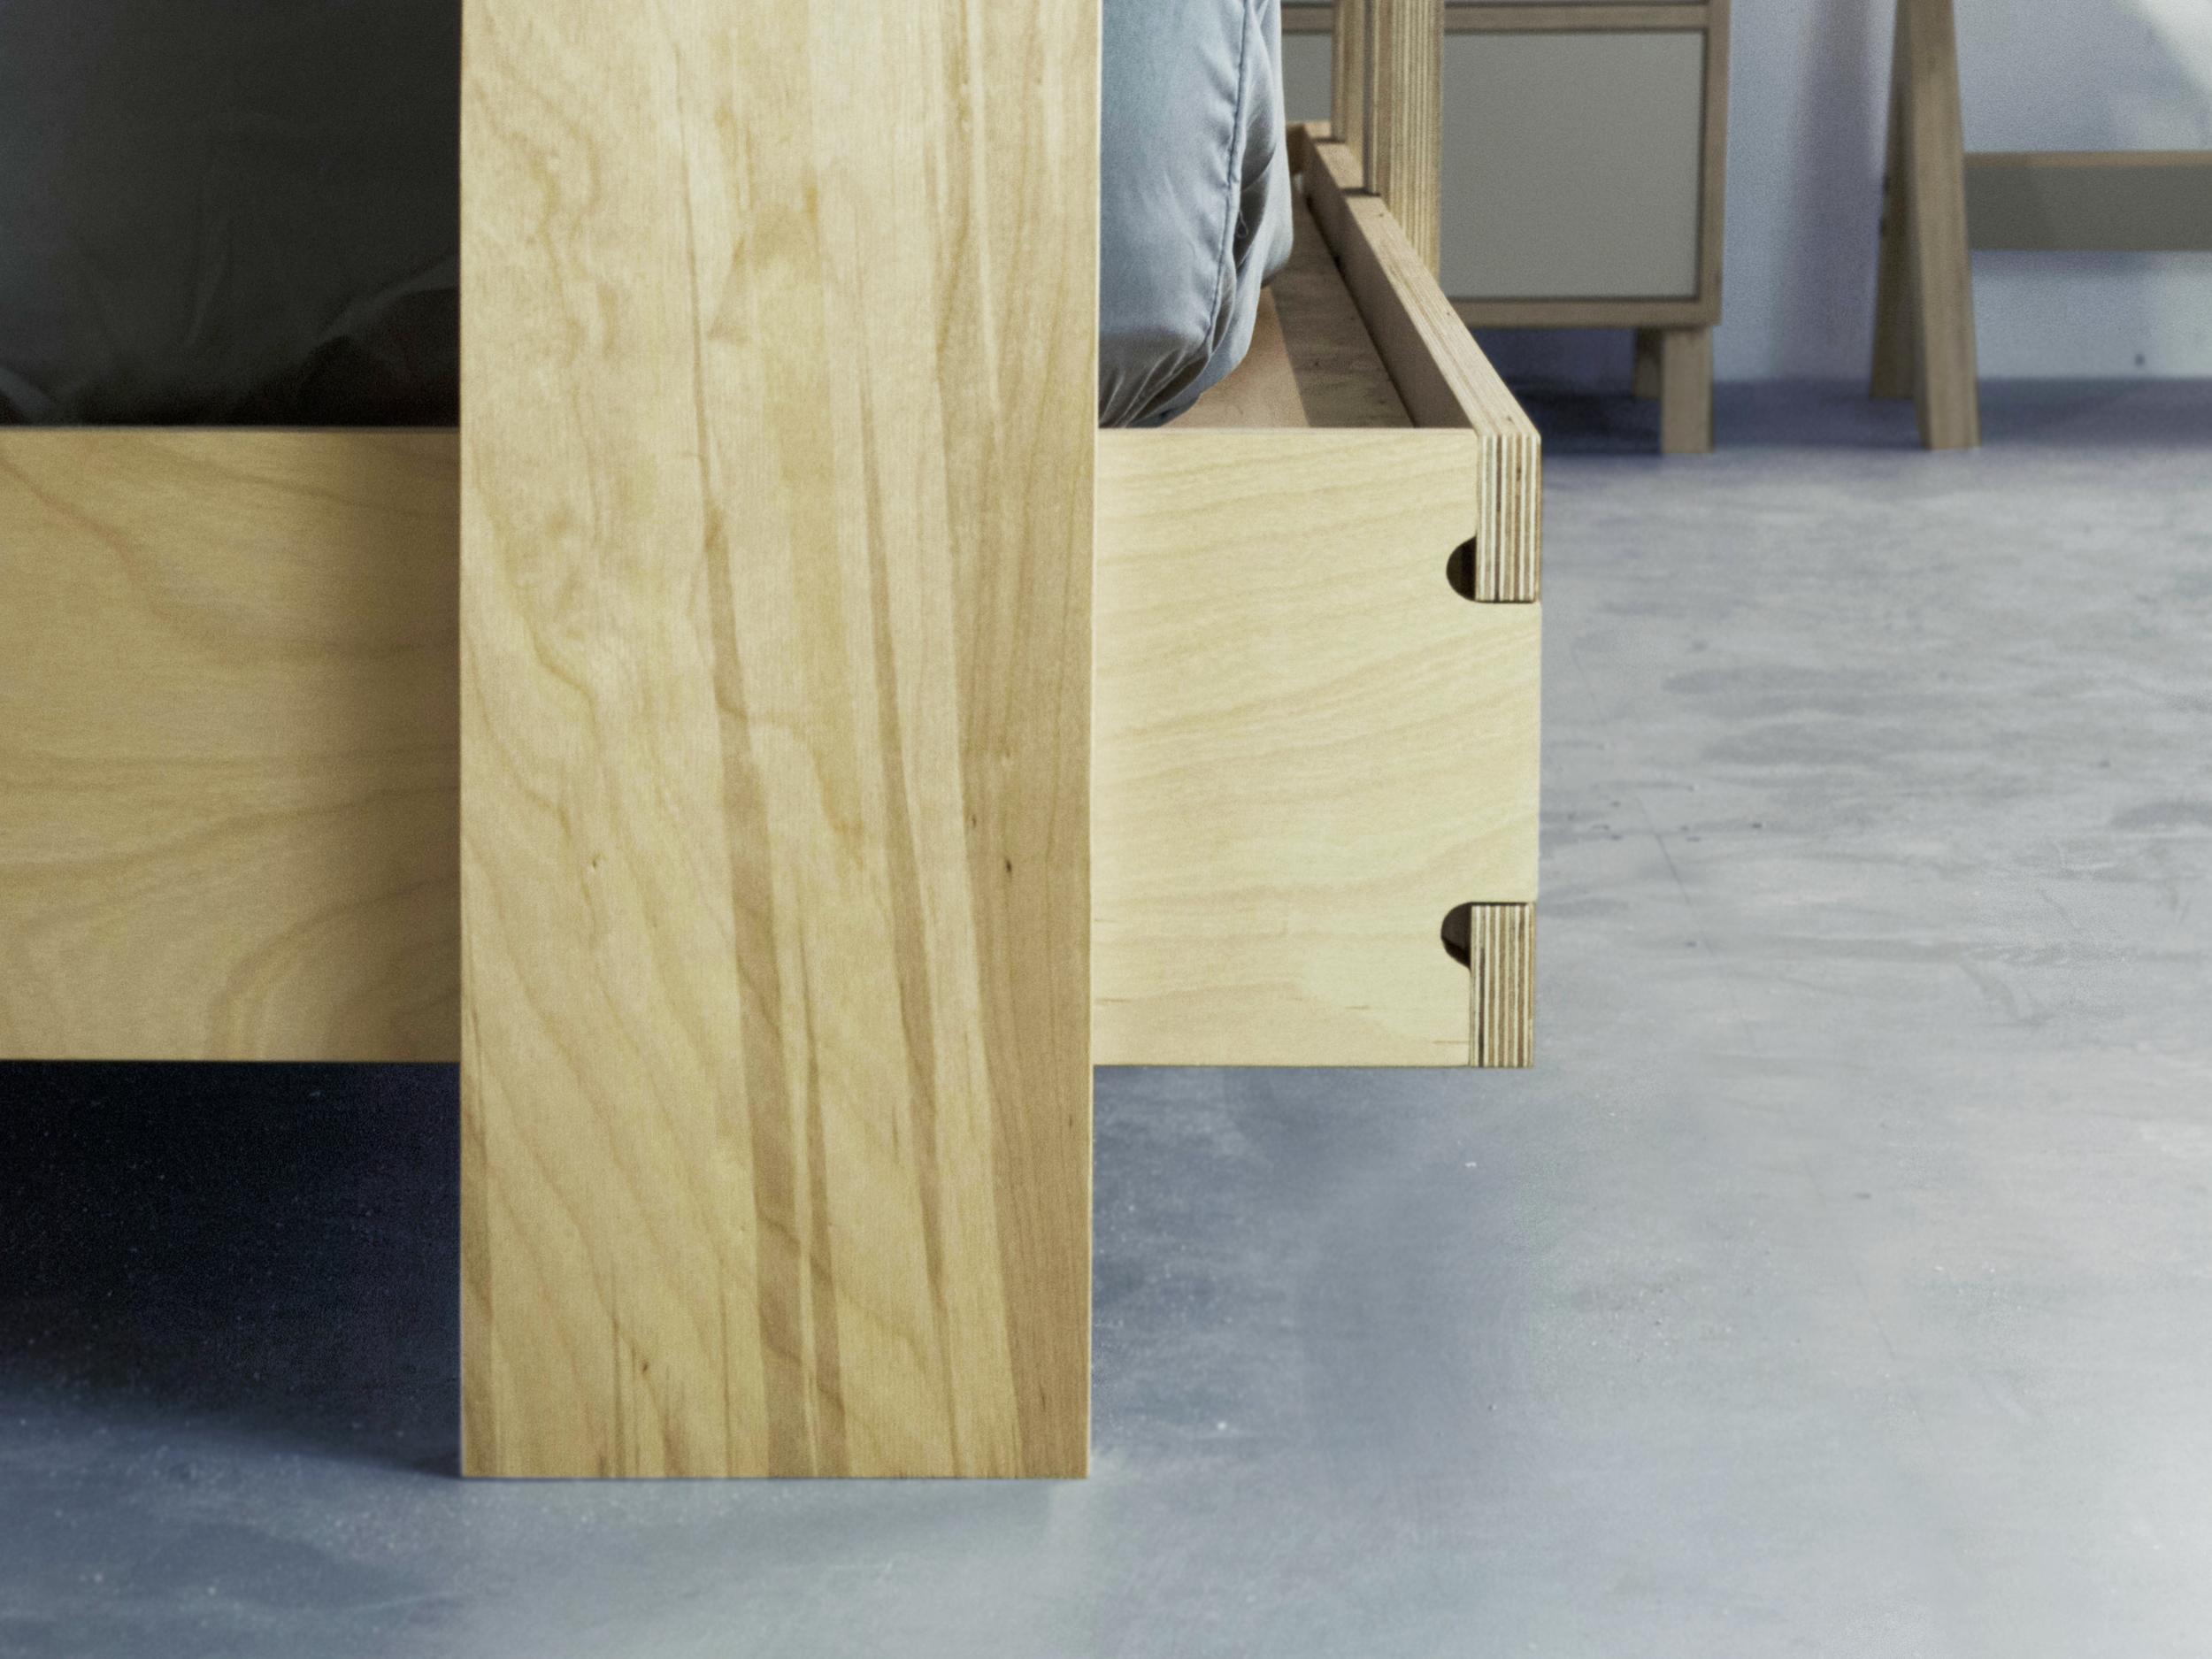 Modern baltic birch bunk bed